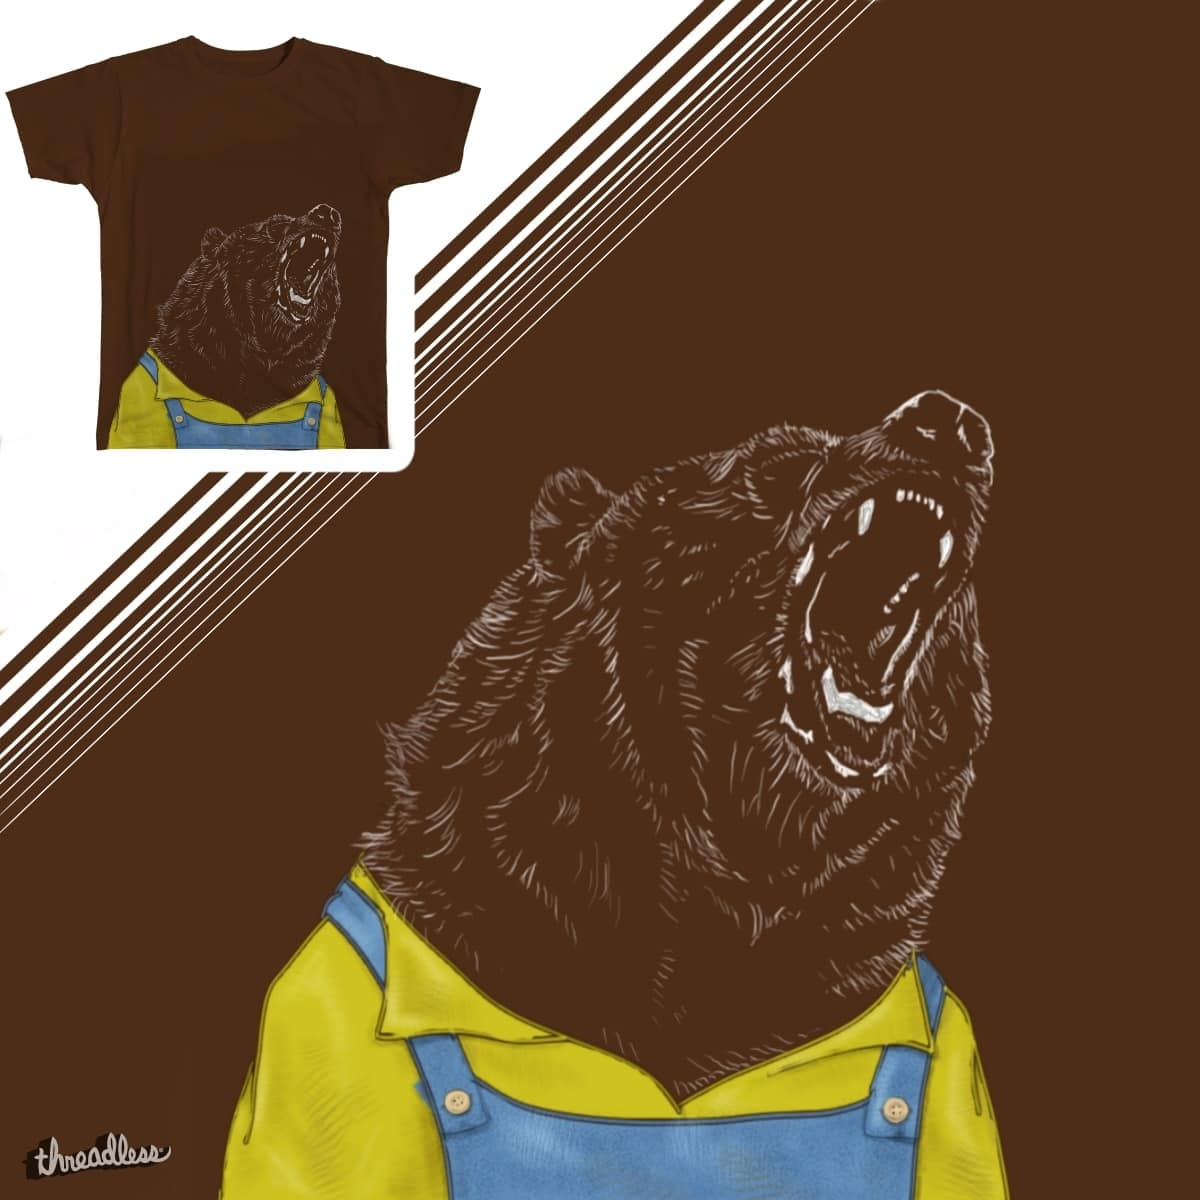 papa bear by FooFox on Threadless